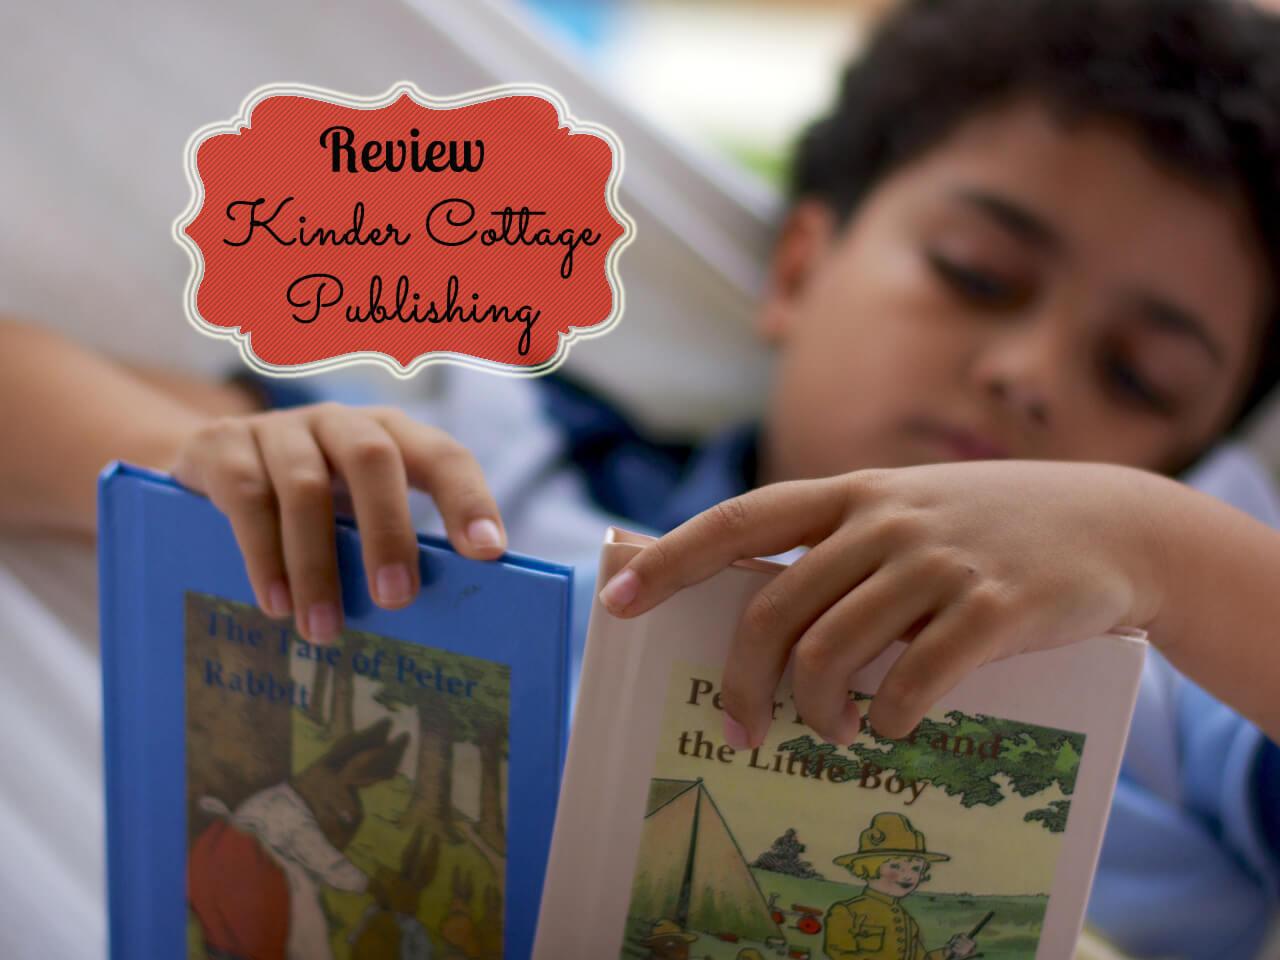 kinder-cottage-publishing-review